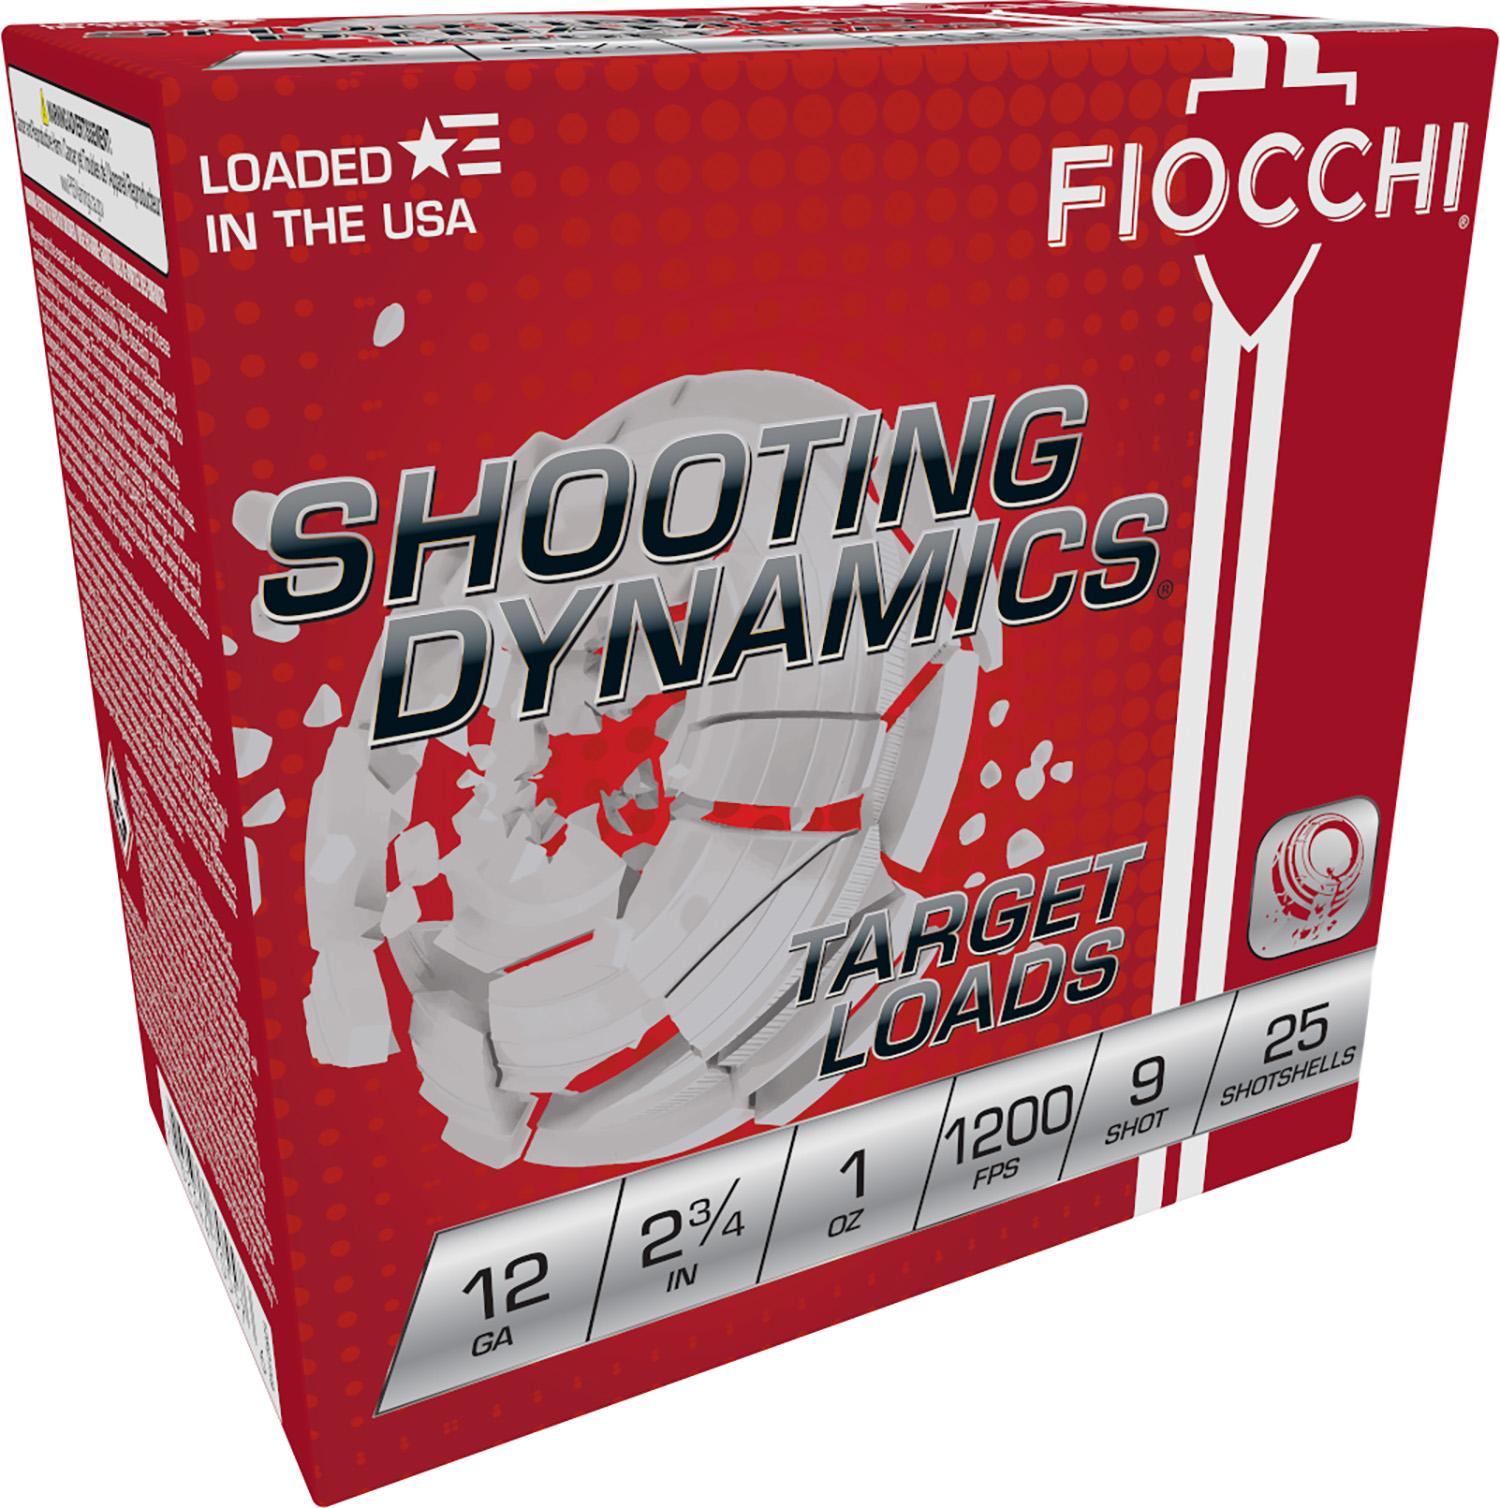 Fiocchi 12SD1H9 Shooting Dynamics Heavy Dynamic  12 Gauge 2.75